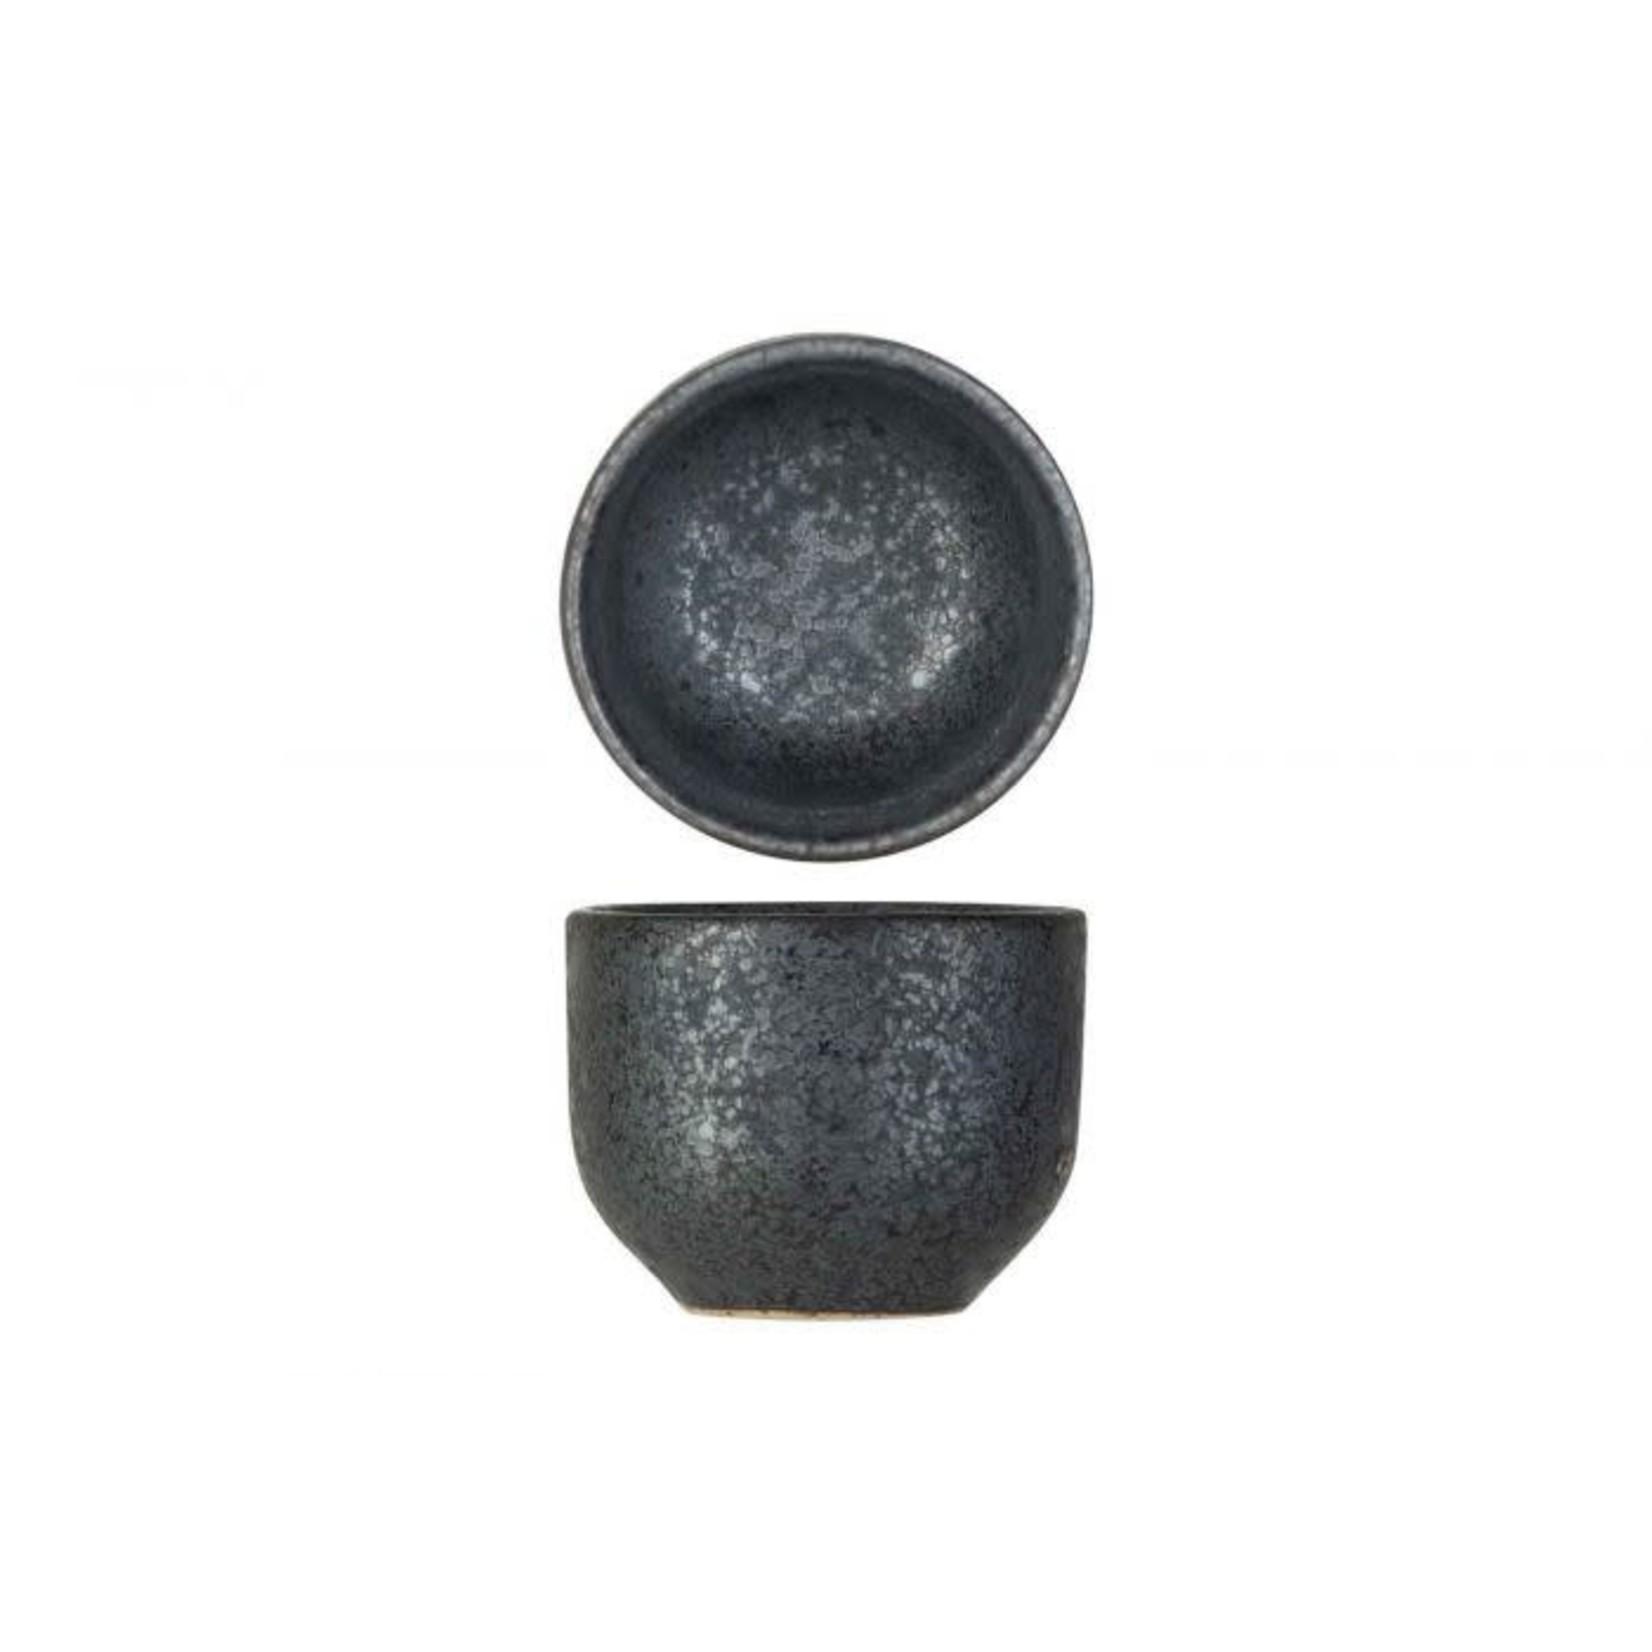 Eierdopje / kommetje grijs 5 x 4cm aardewerk